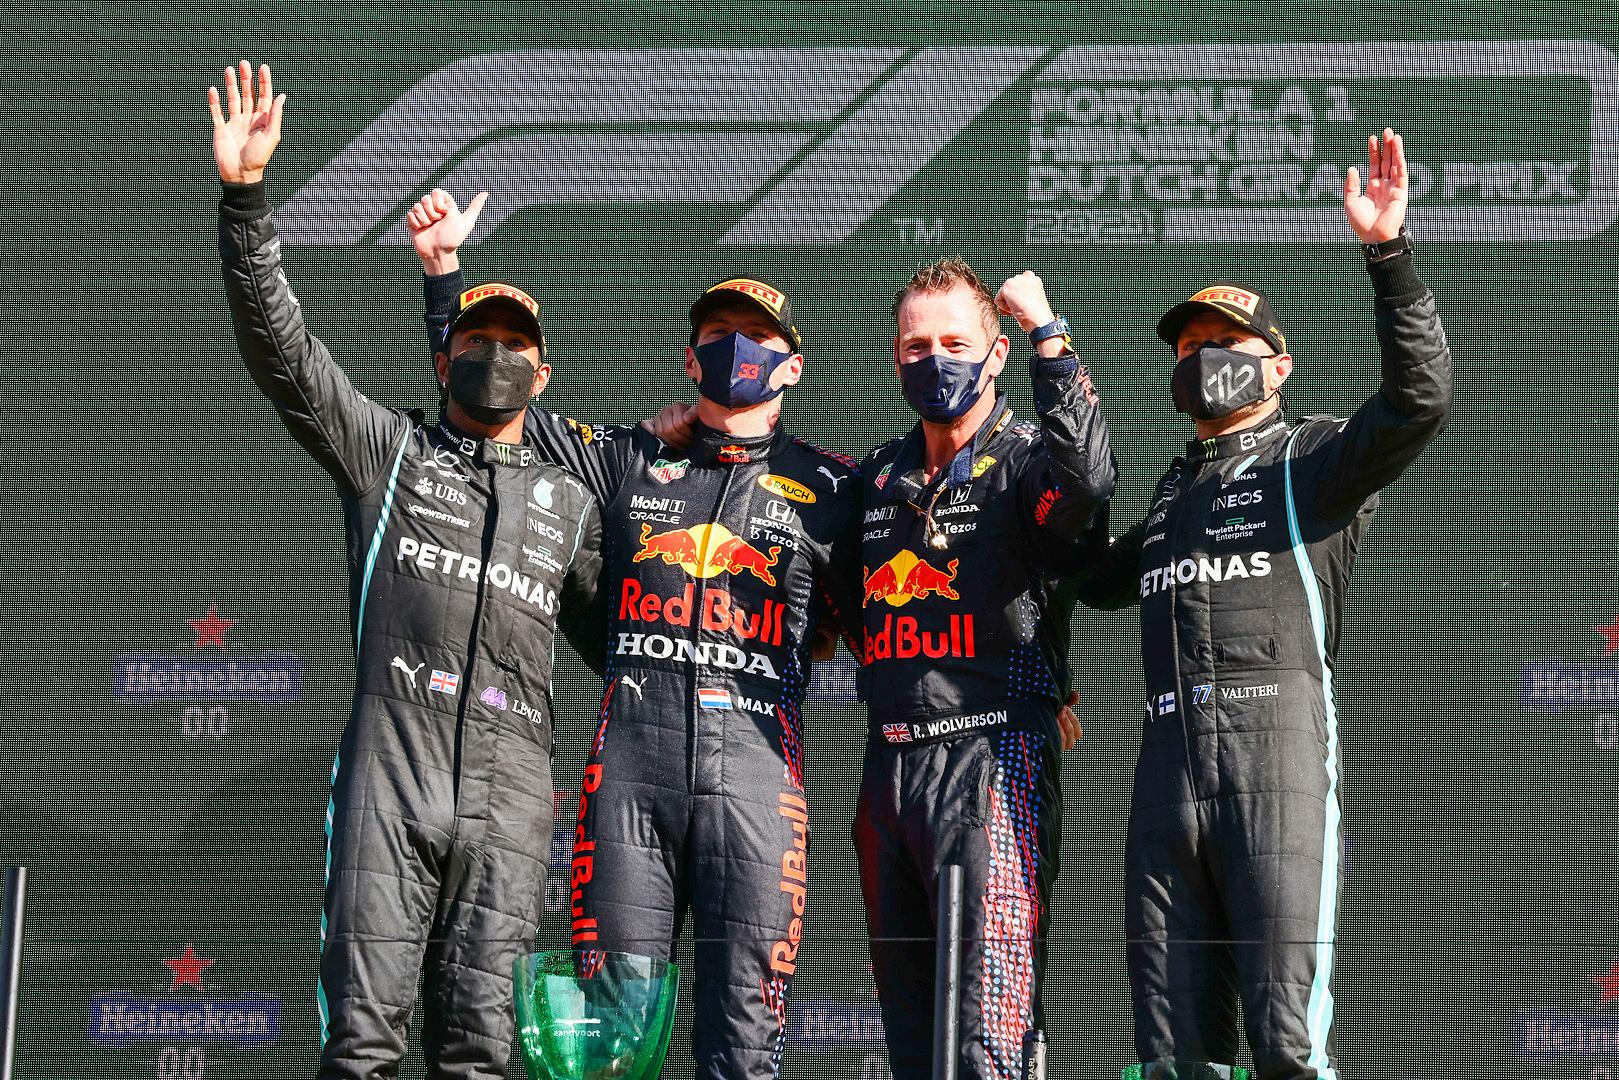 Double podium finish for the Mercedes-AMG Petronas F1 Team at Zandvoort